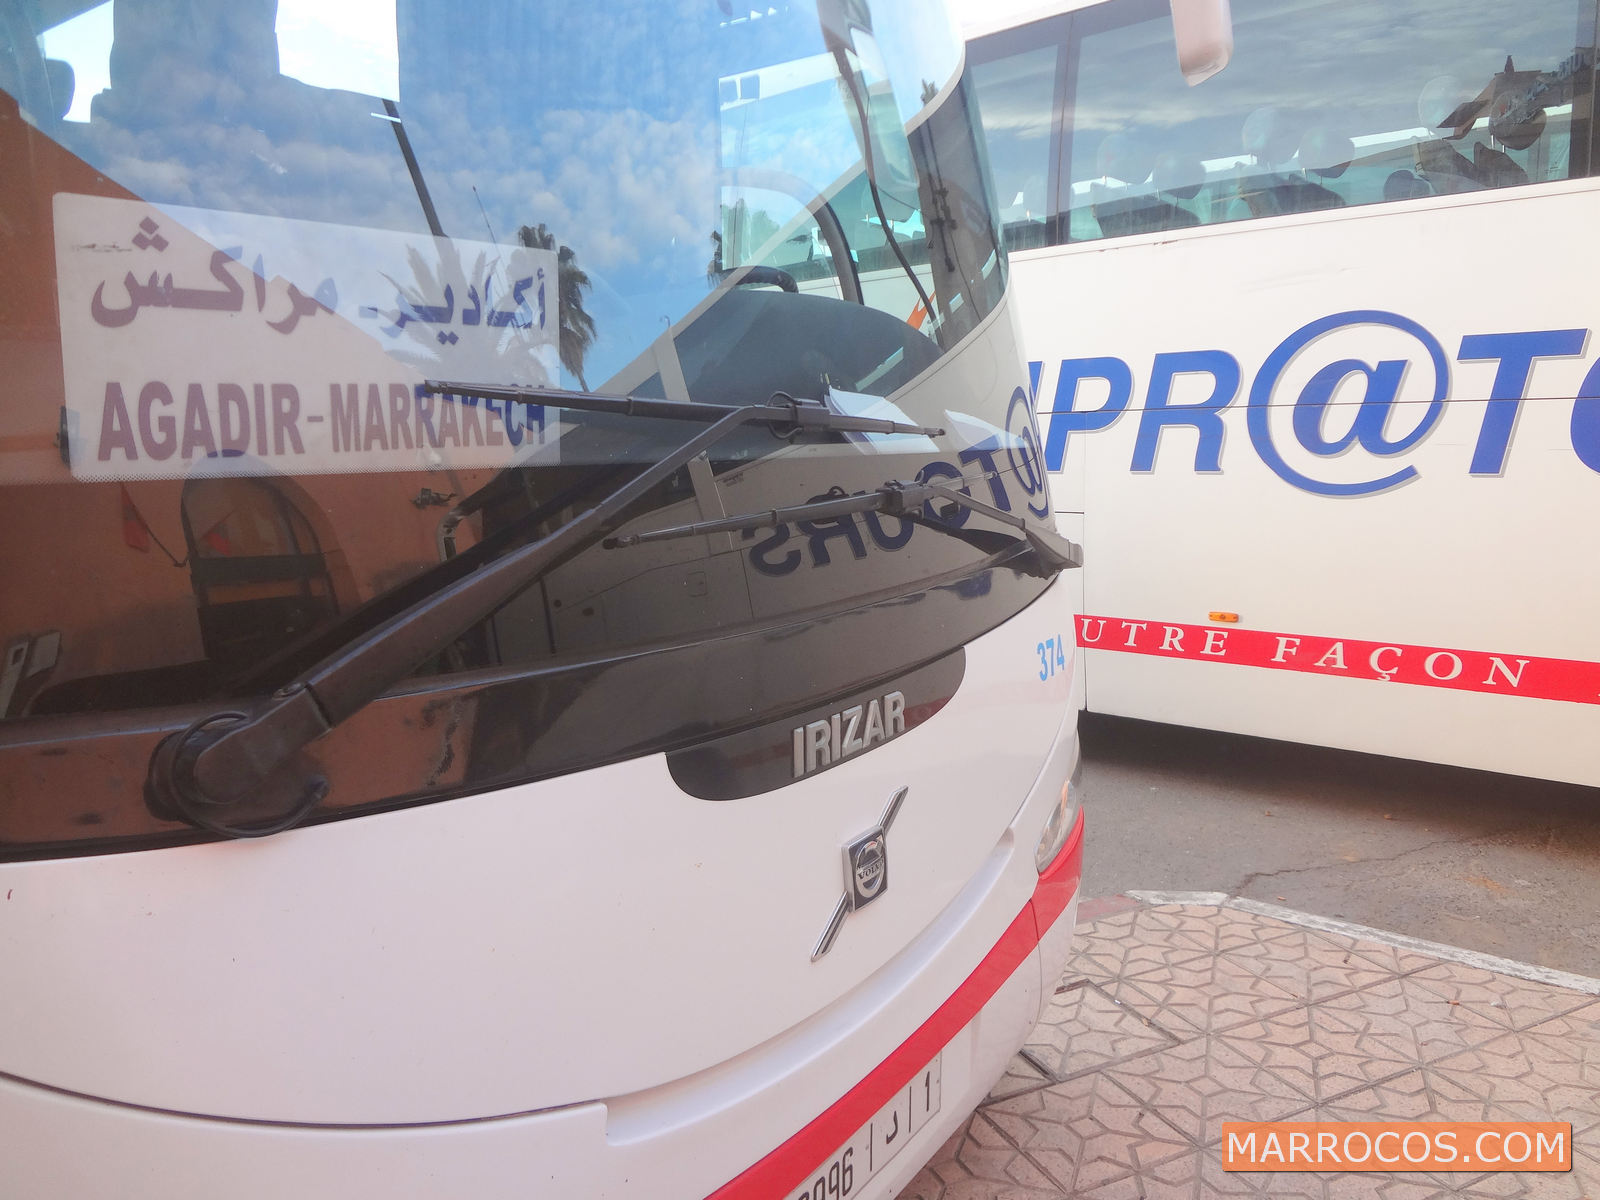 Viajar de autocarro (ônibus) em Marrocos AUTOCARRO MARROCOS 2 Transportes